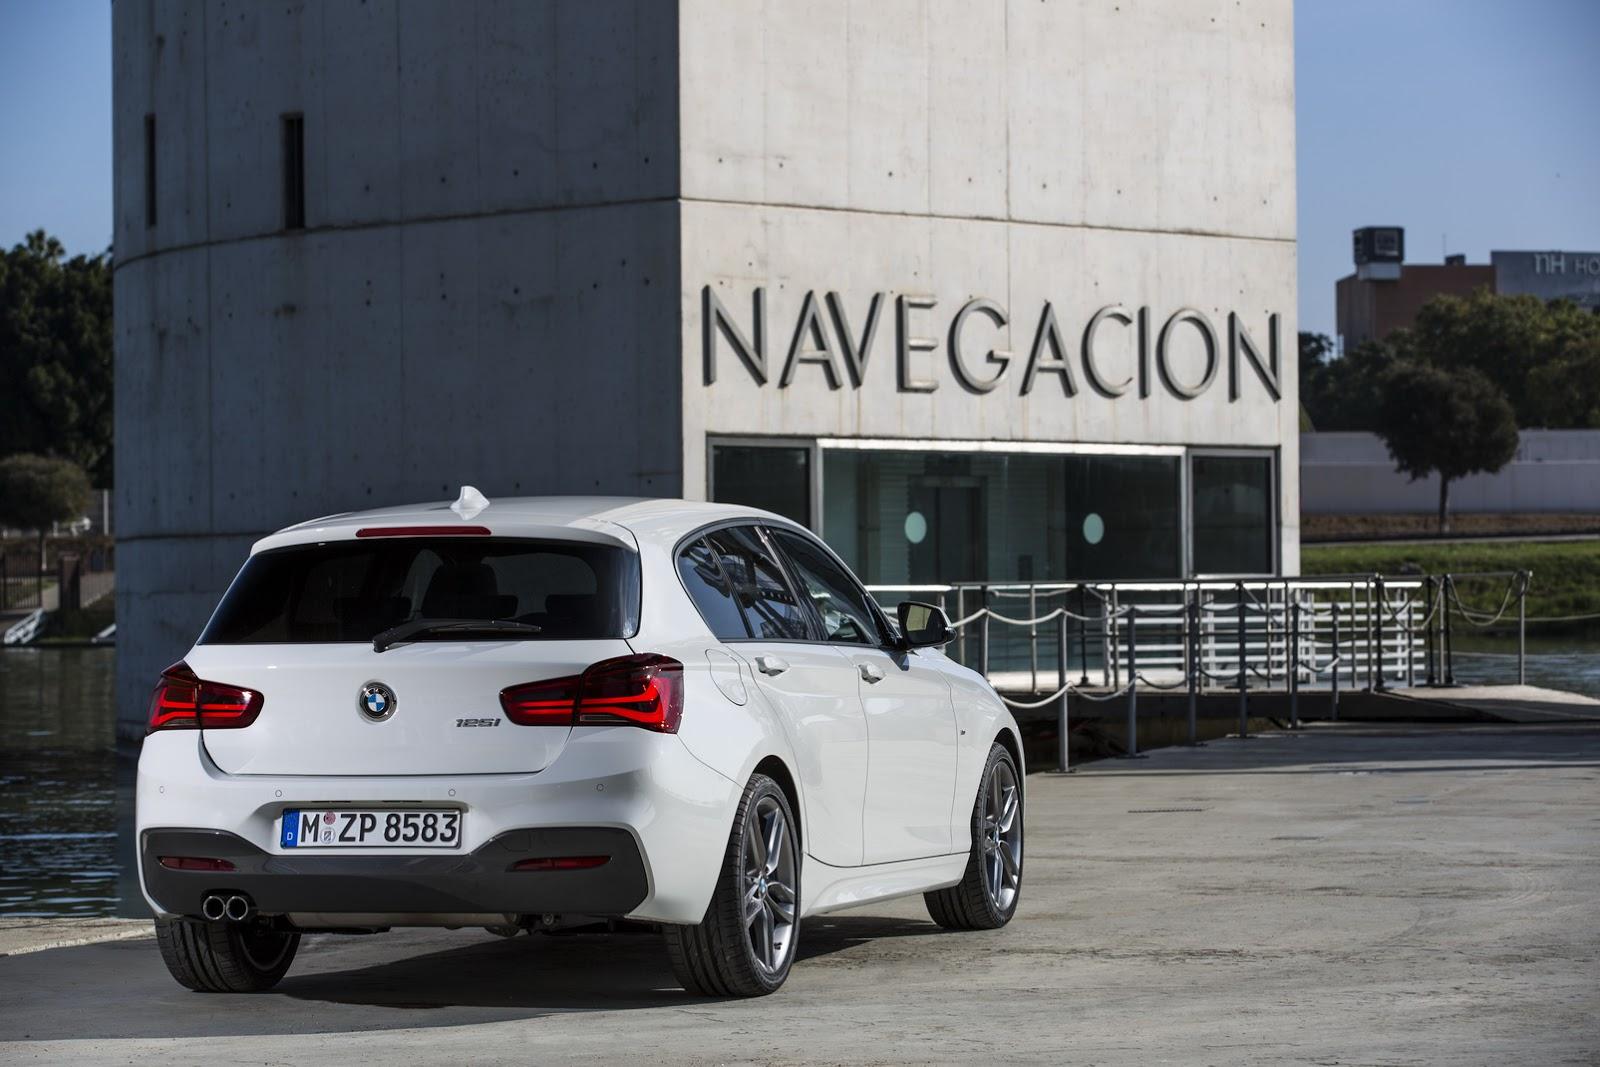 BMW Seria 1 facelift 2015 - floteauto 2